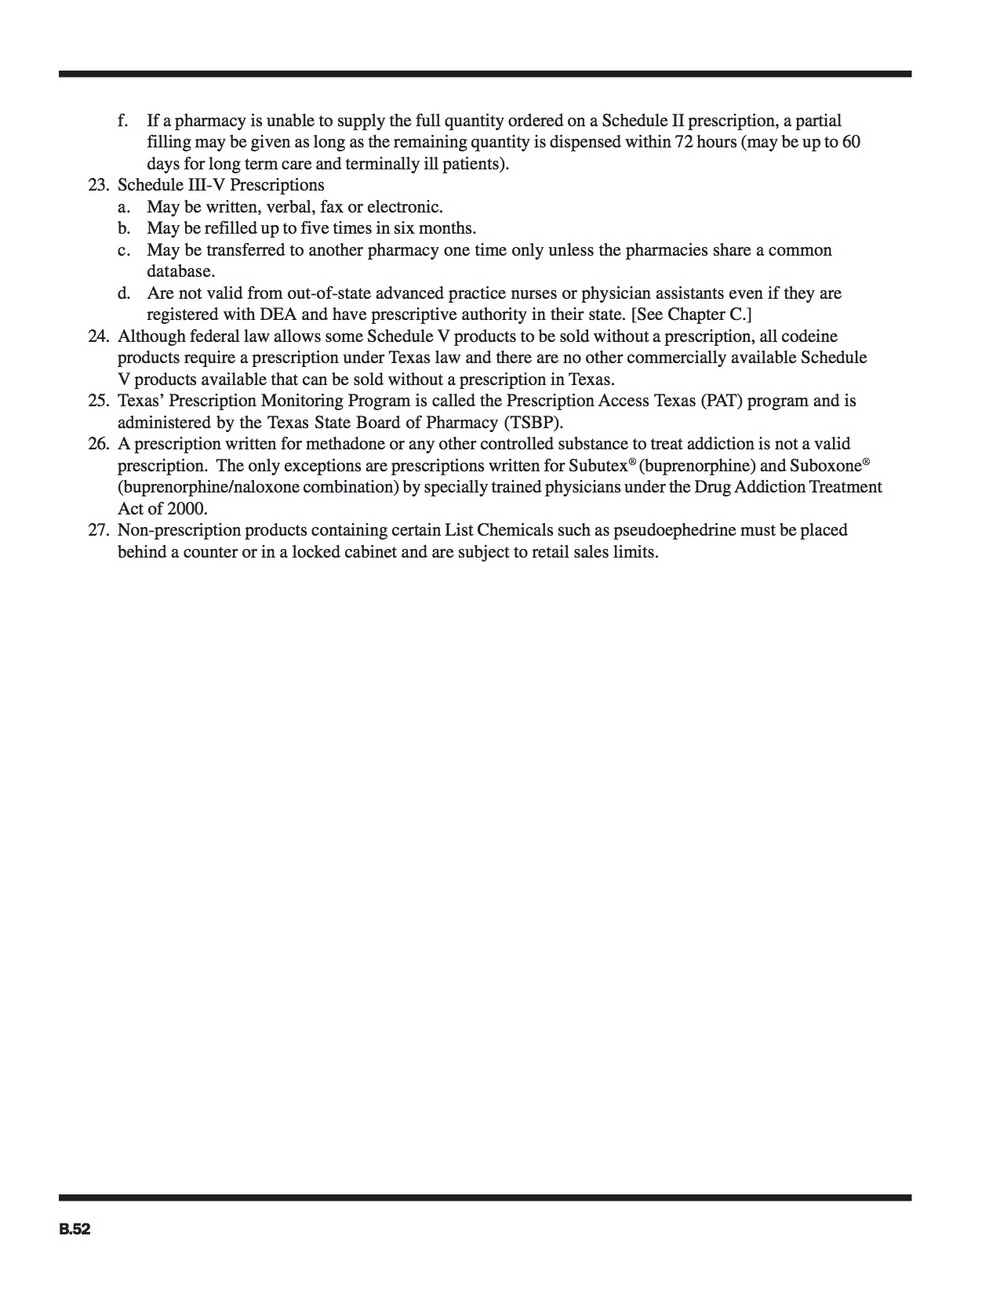 Chapter B_Draft-2 52.jpg